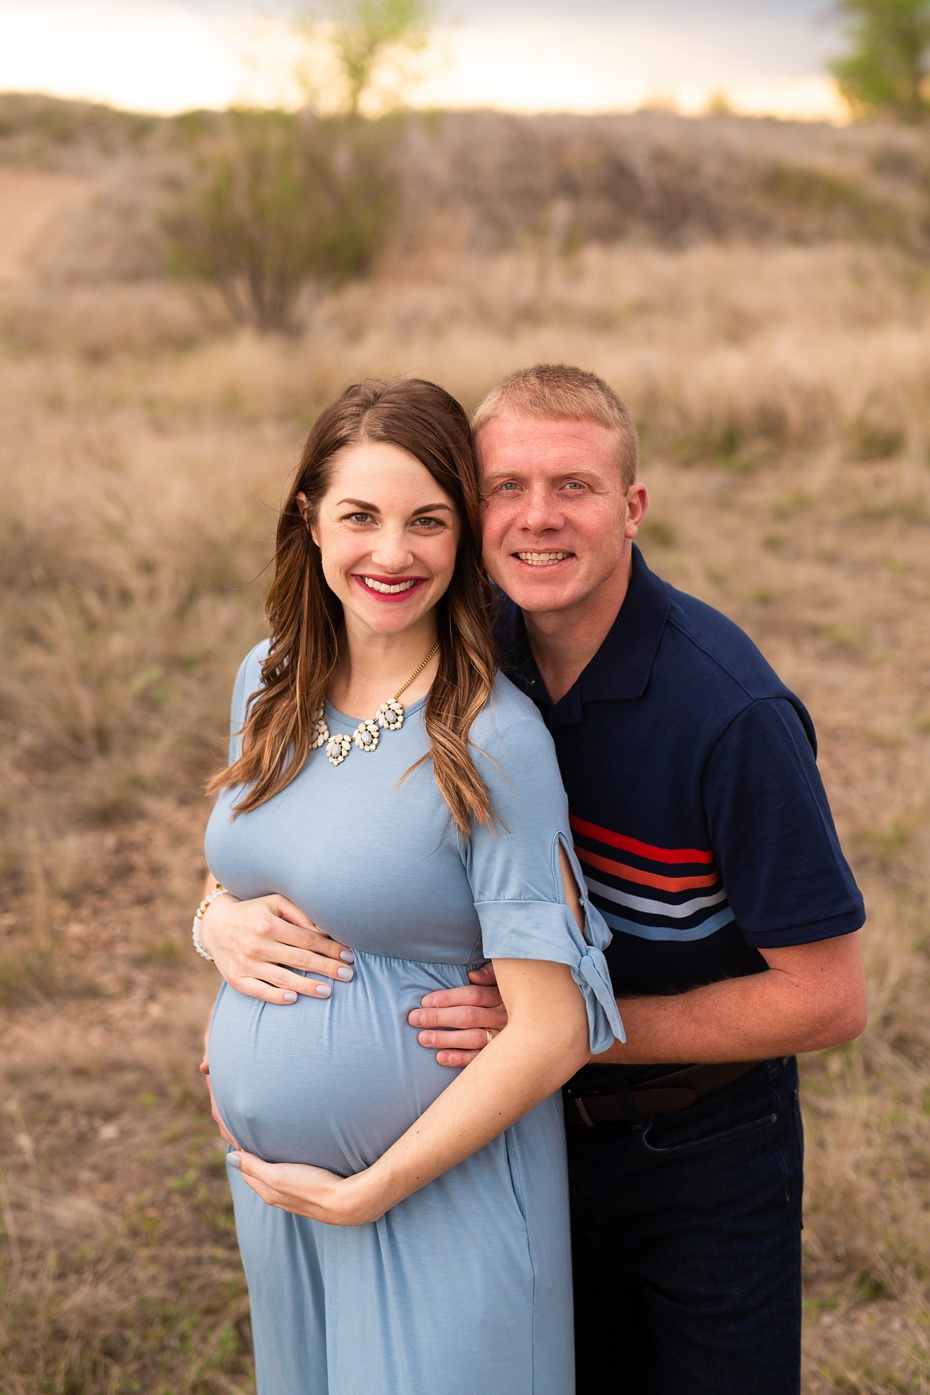 maternity_truly_you_photography_enid_photographer-19_web.jpg